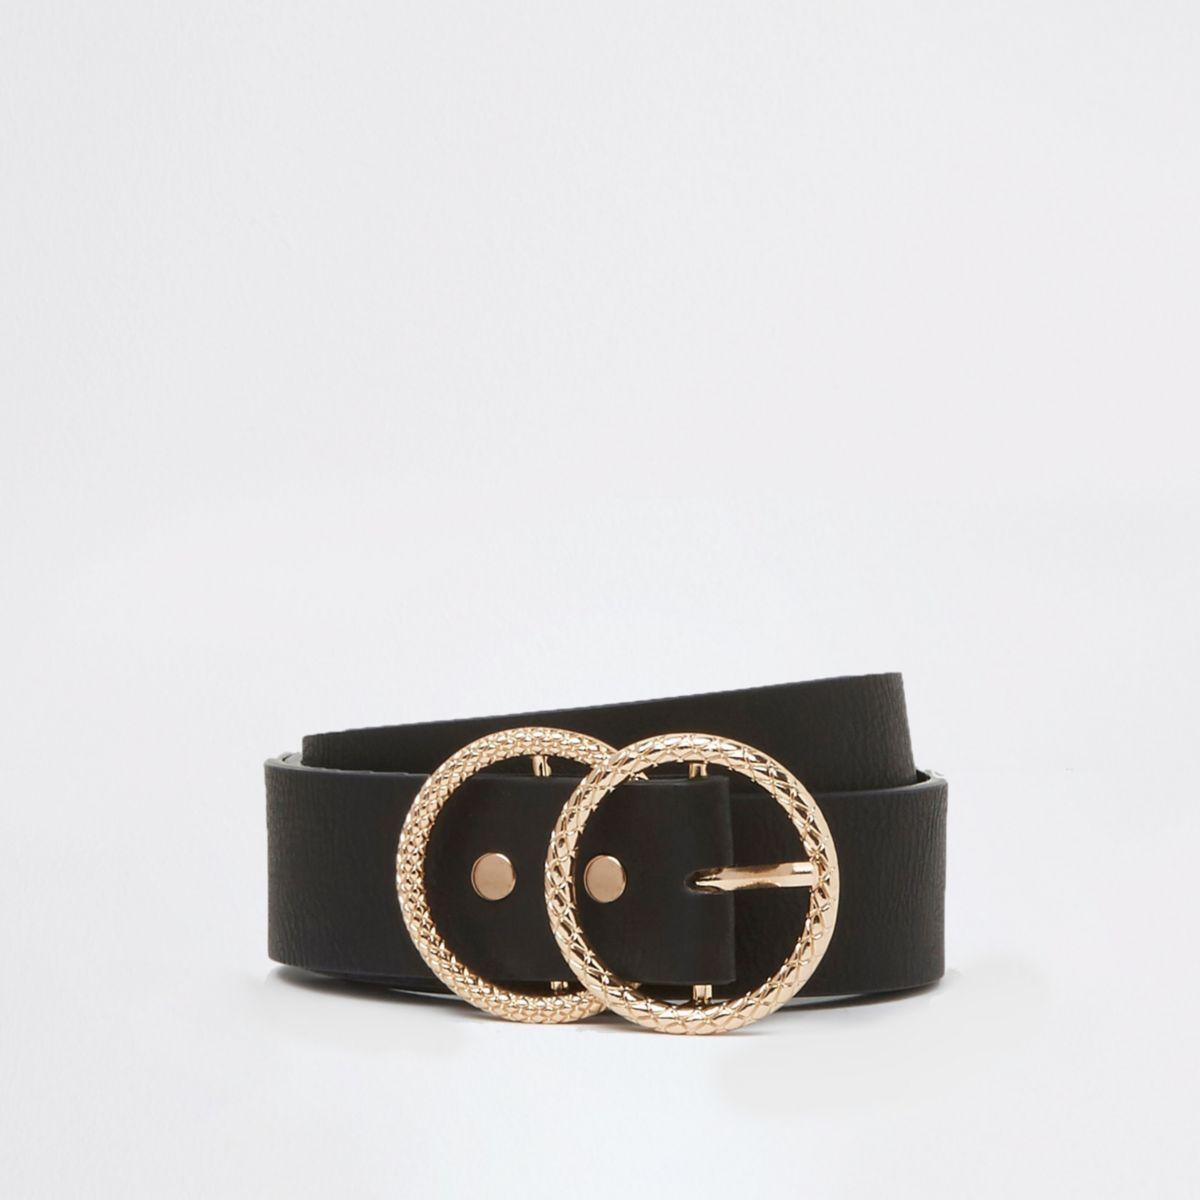 Black textured double buckle jeans belt